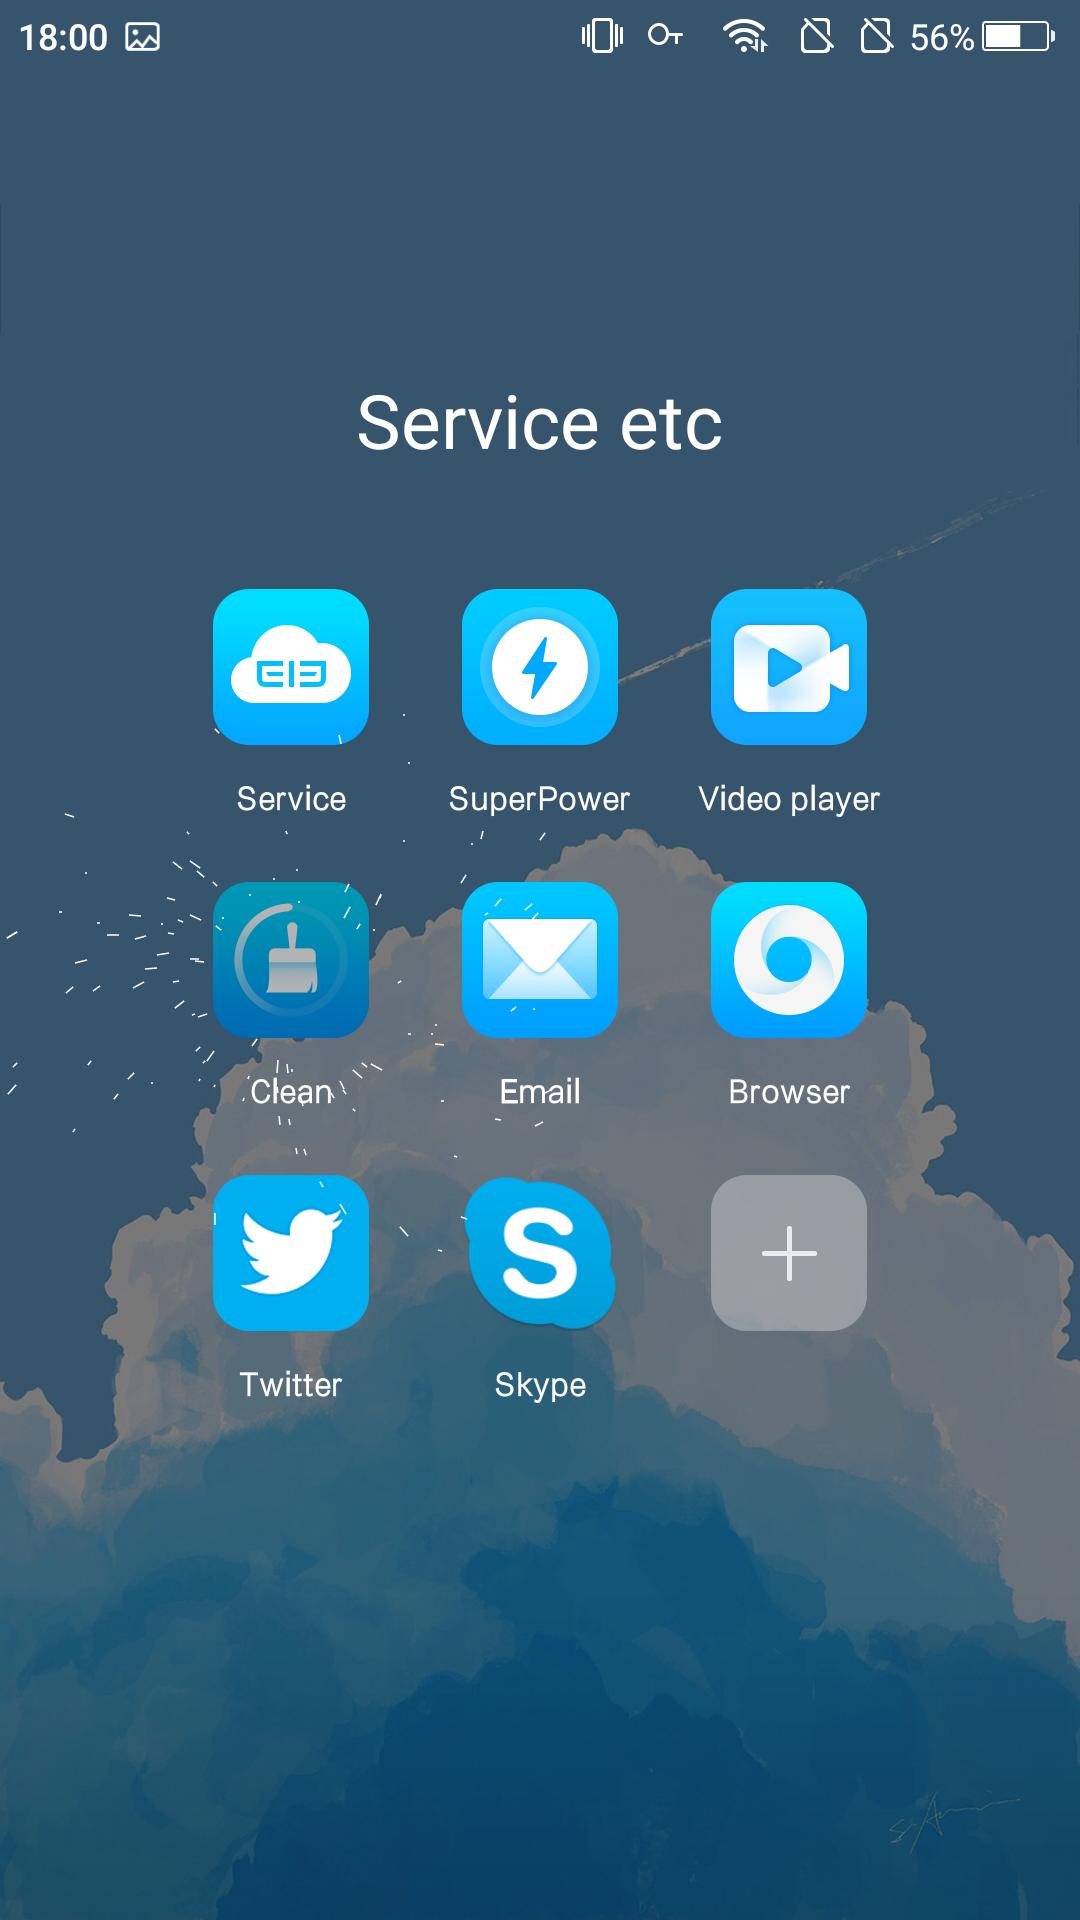 ELE OS 1.0 Services